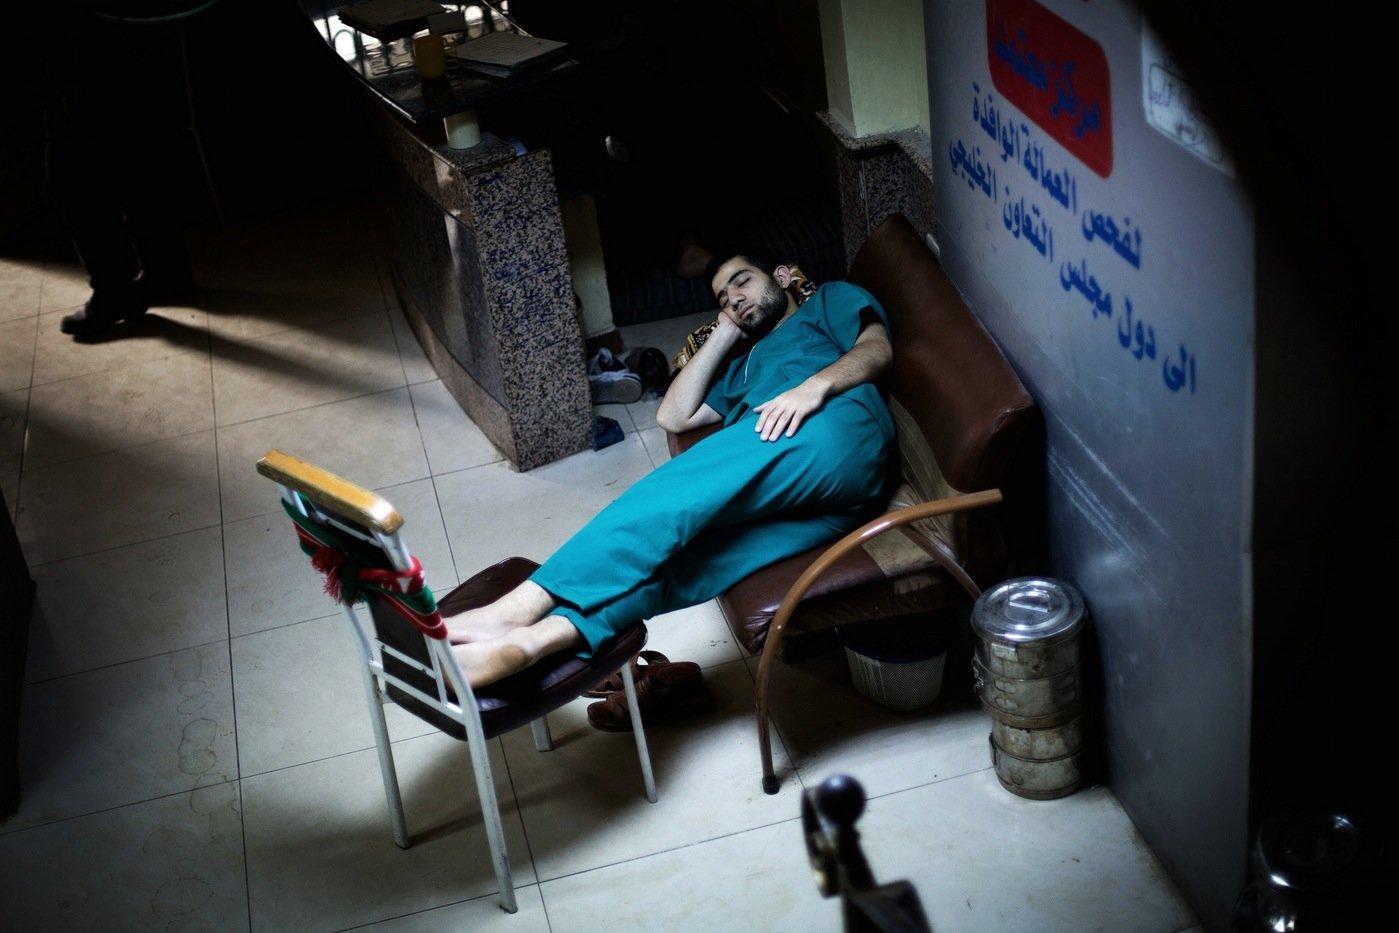 A Syrian doctor sleeps in the waiting room of Dar al-Shifa hospital in Aleppo on Oct. 21,